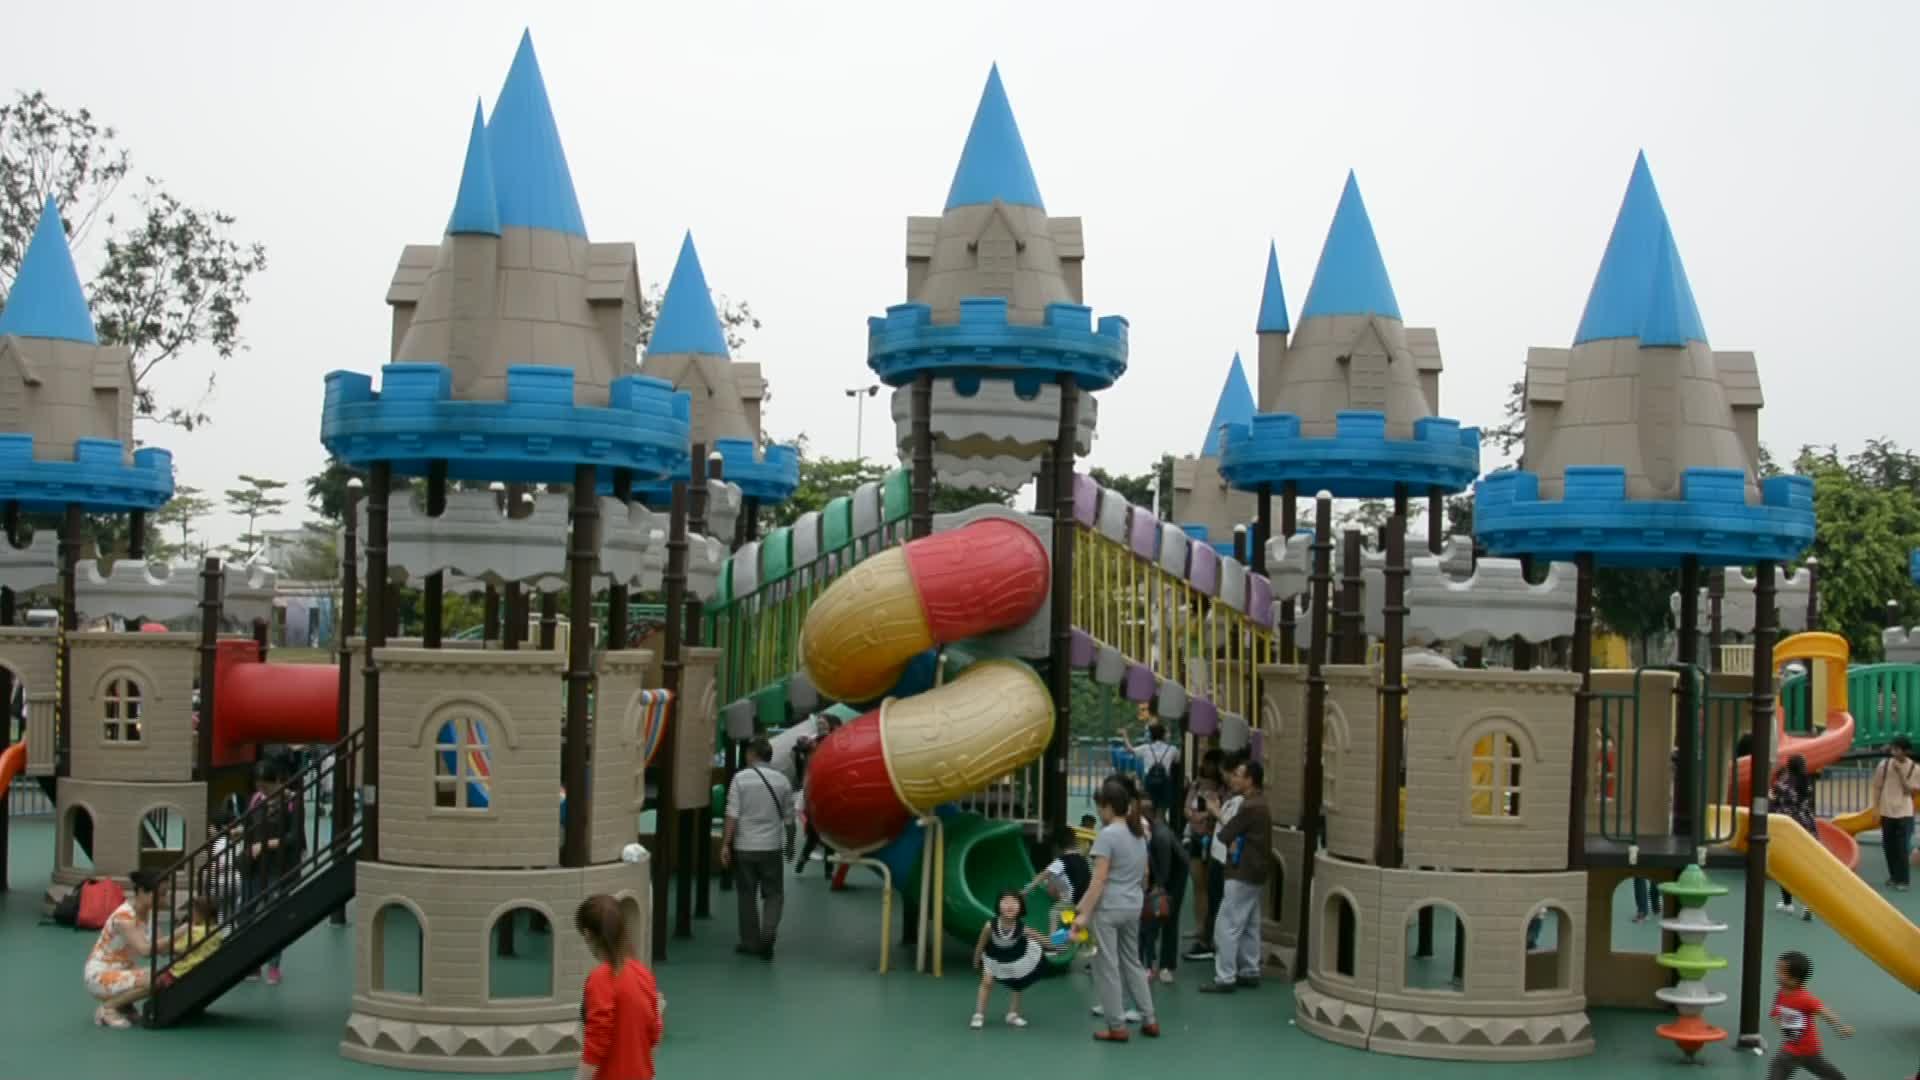 plastic toys kids outdoor pirate ship playground, outdoor playground equipment